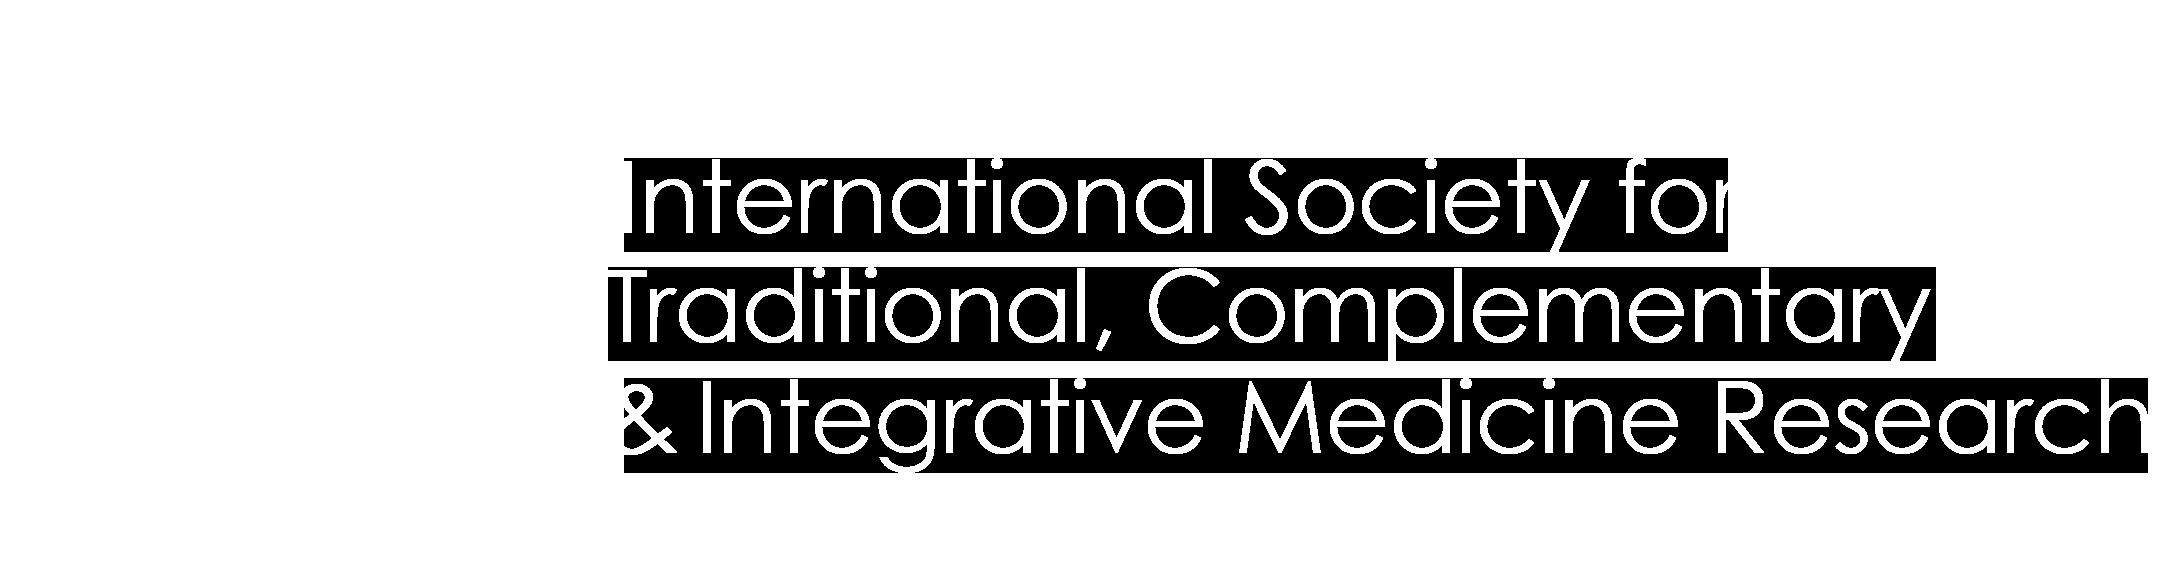 ISCMR